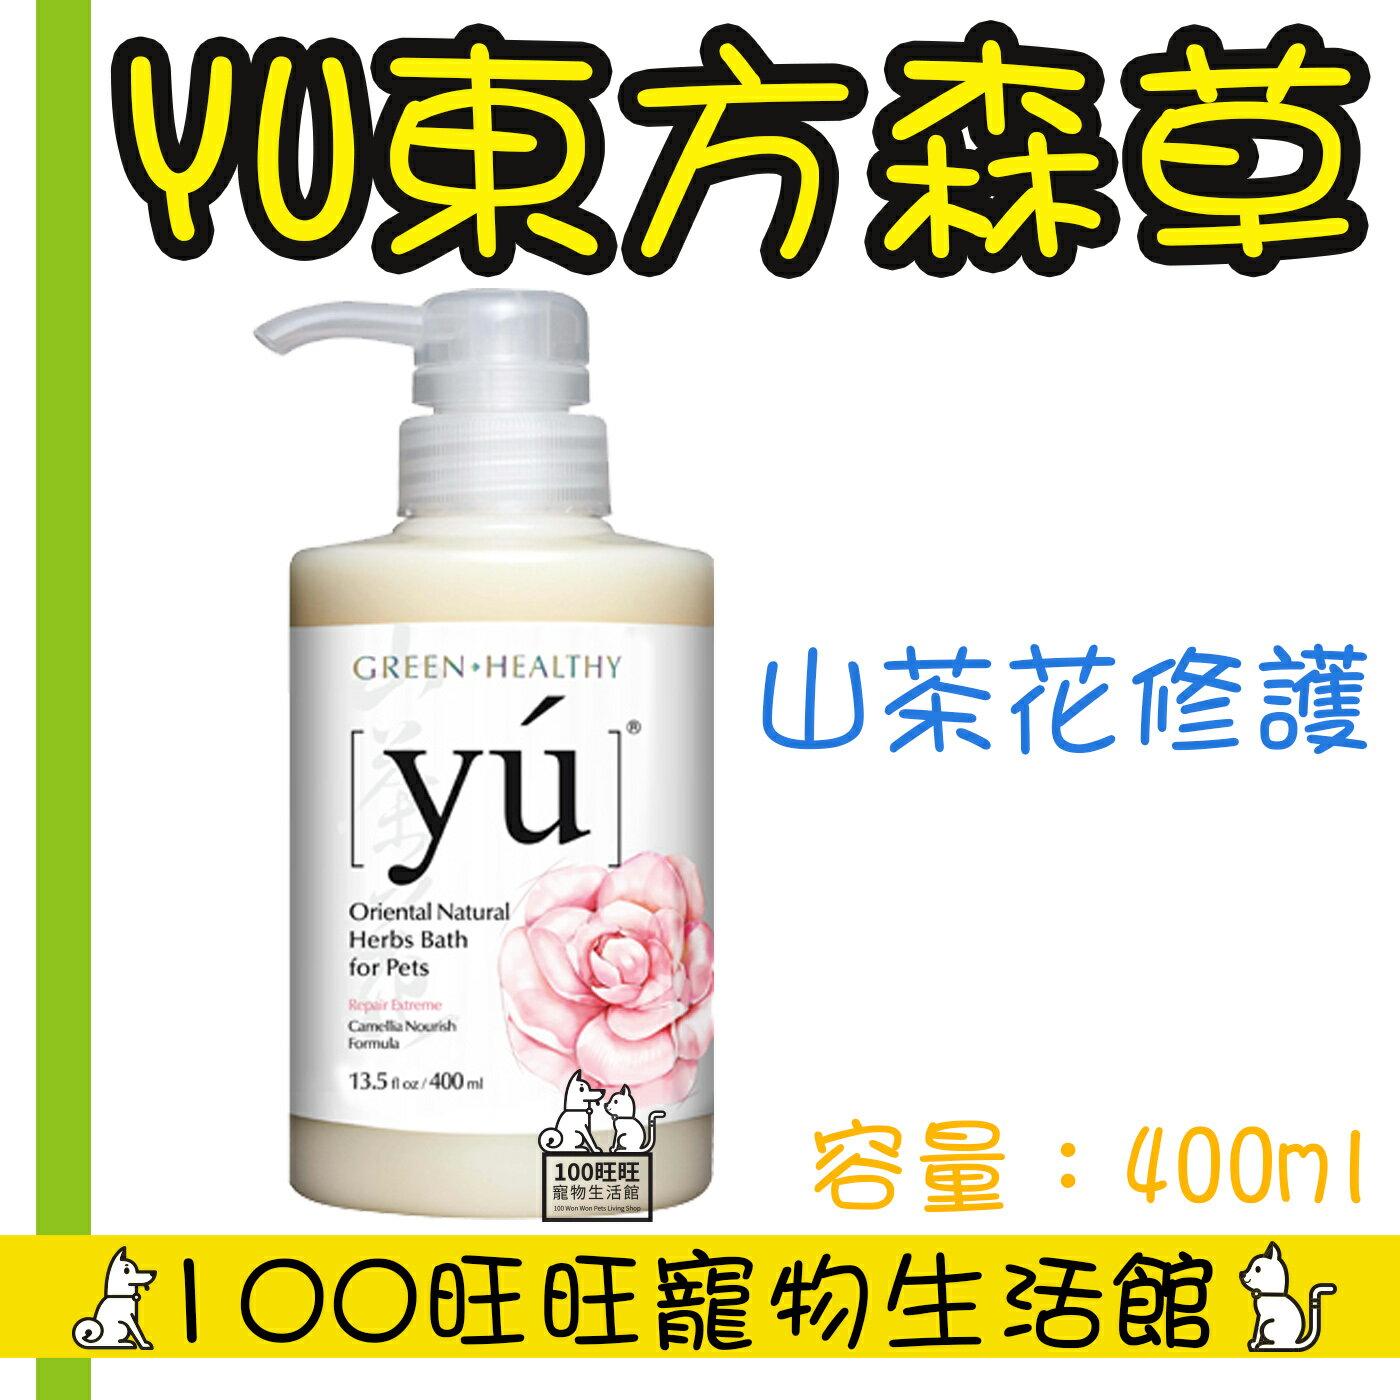 YU 東方森草寵物沐浴乳 含有機認證成分 山茶花修護配方 400ml 寵物洗毛精